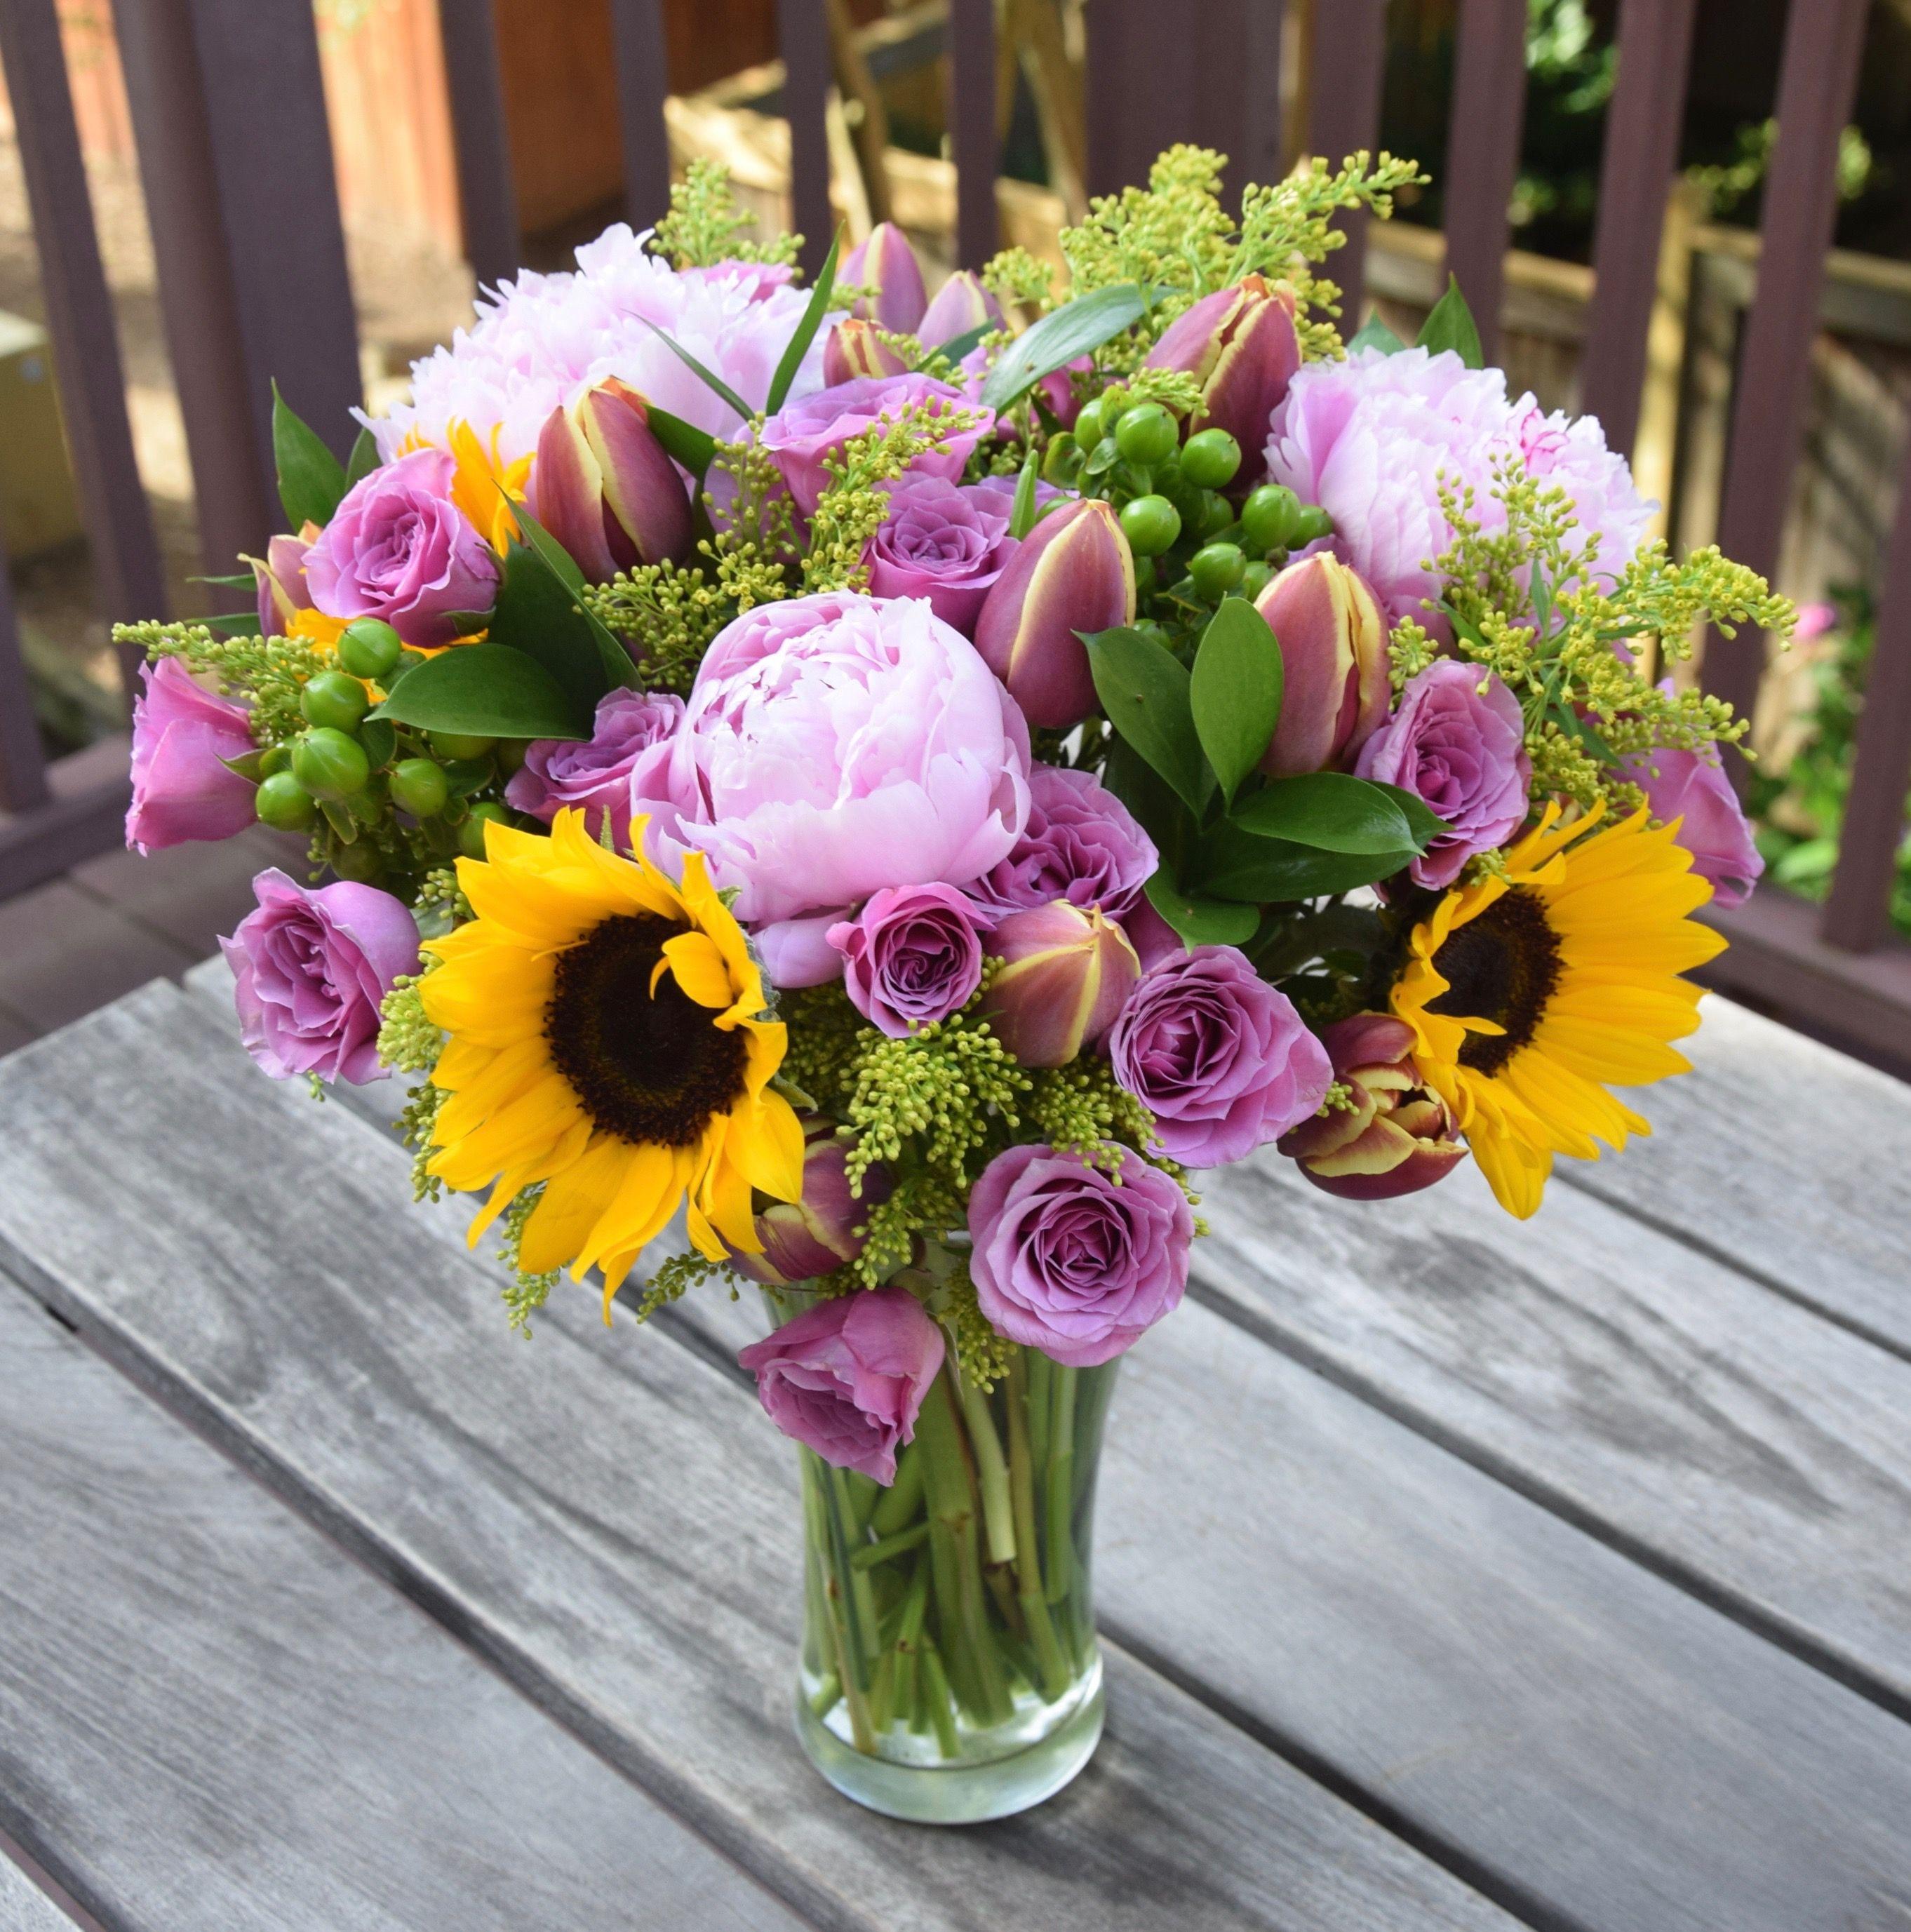 Table Flower Arrangement Consist Of Sunflower Roses Eustomas To Brighten The Work Day Shop Flower Delivery Same Day Flower Delivery Table Flower Arrangements